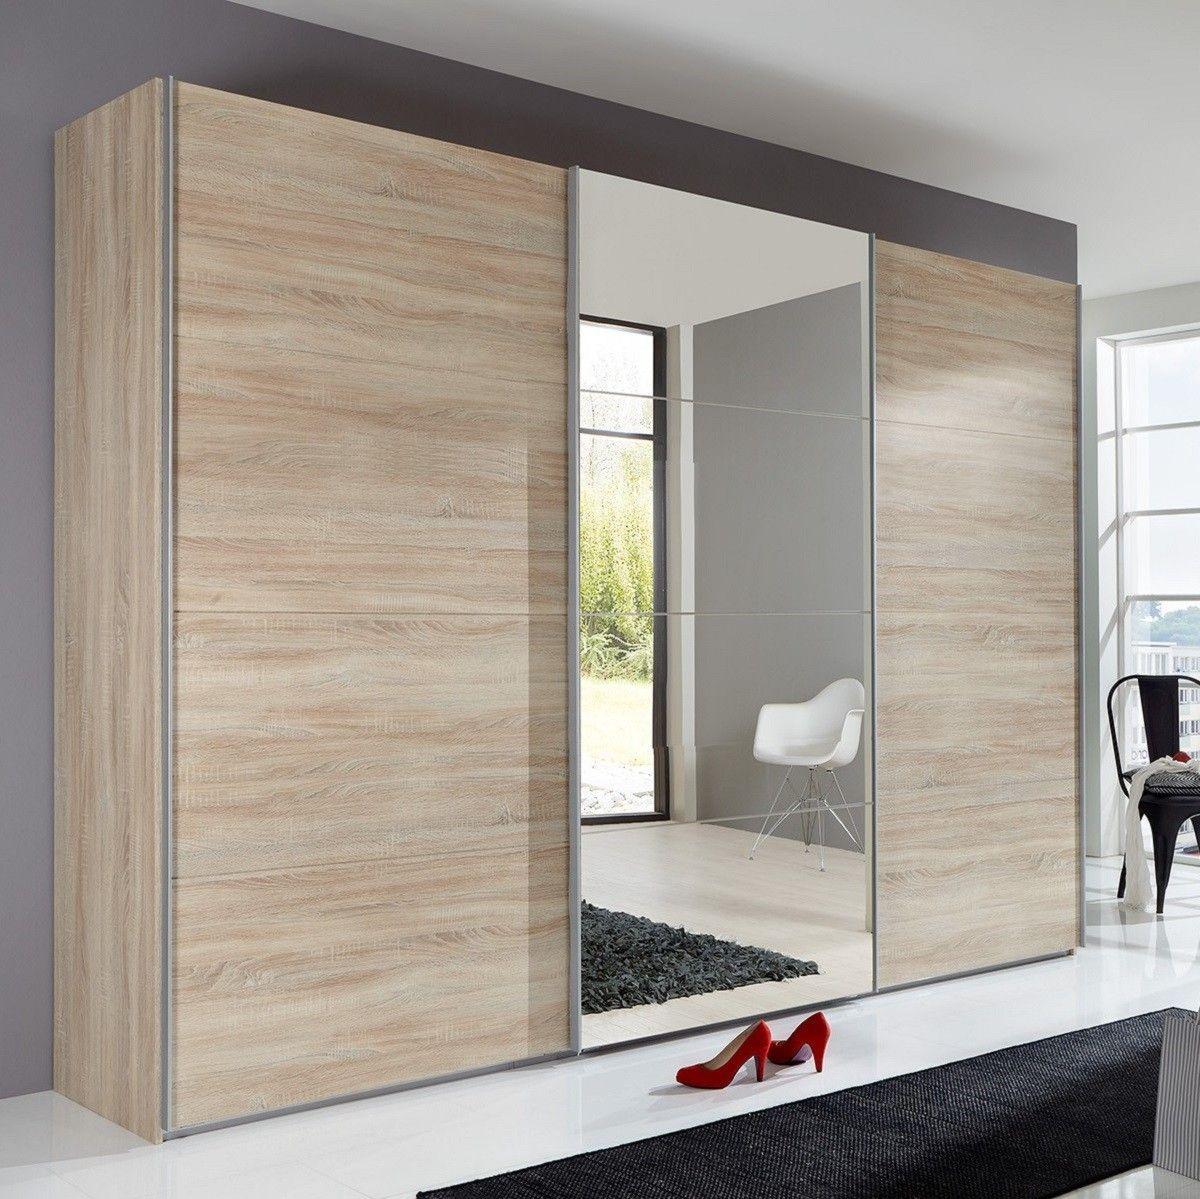 slumberhaus_german_ernie_oak_mirror_3_door_270cm_sliding